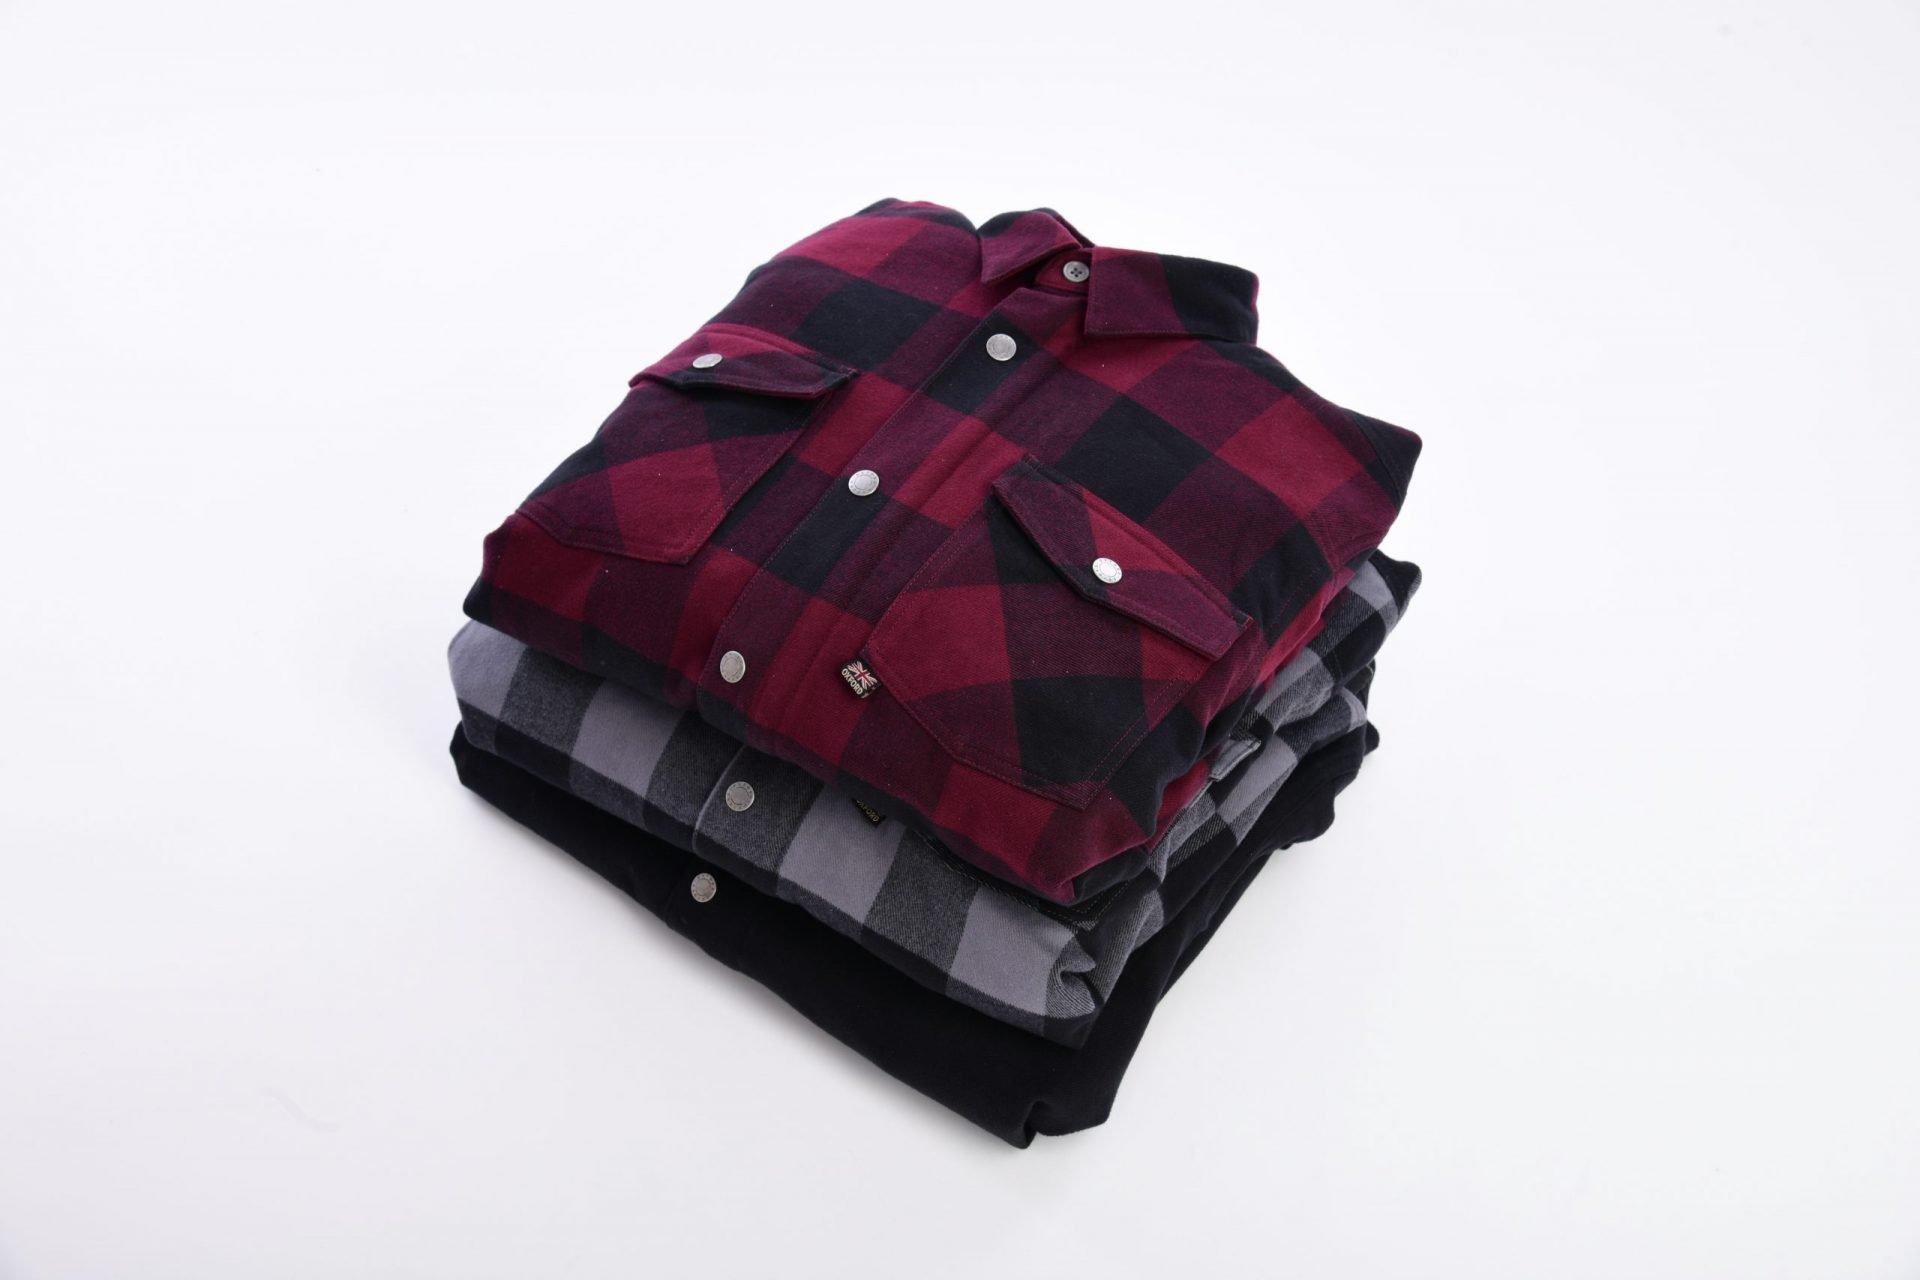 Kickback_Detail_6-scaled Kickback 2.0 Shirt